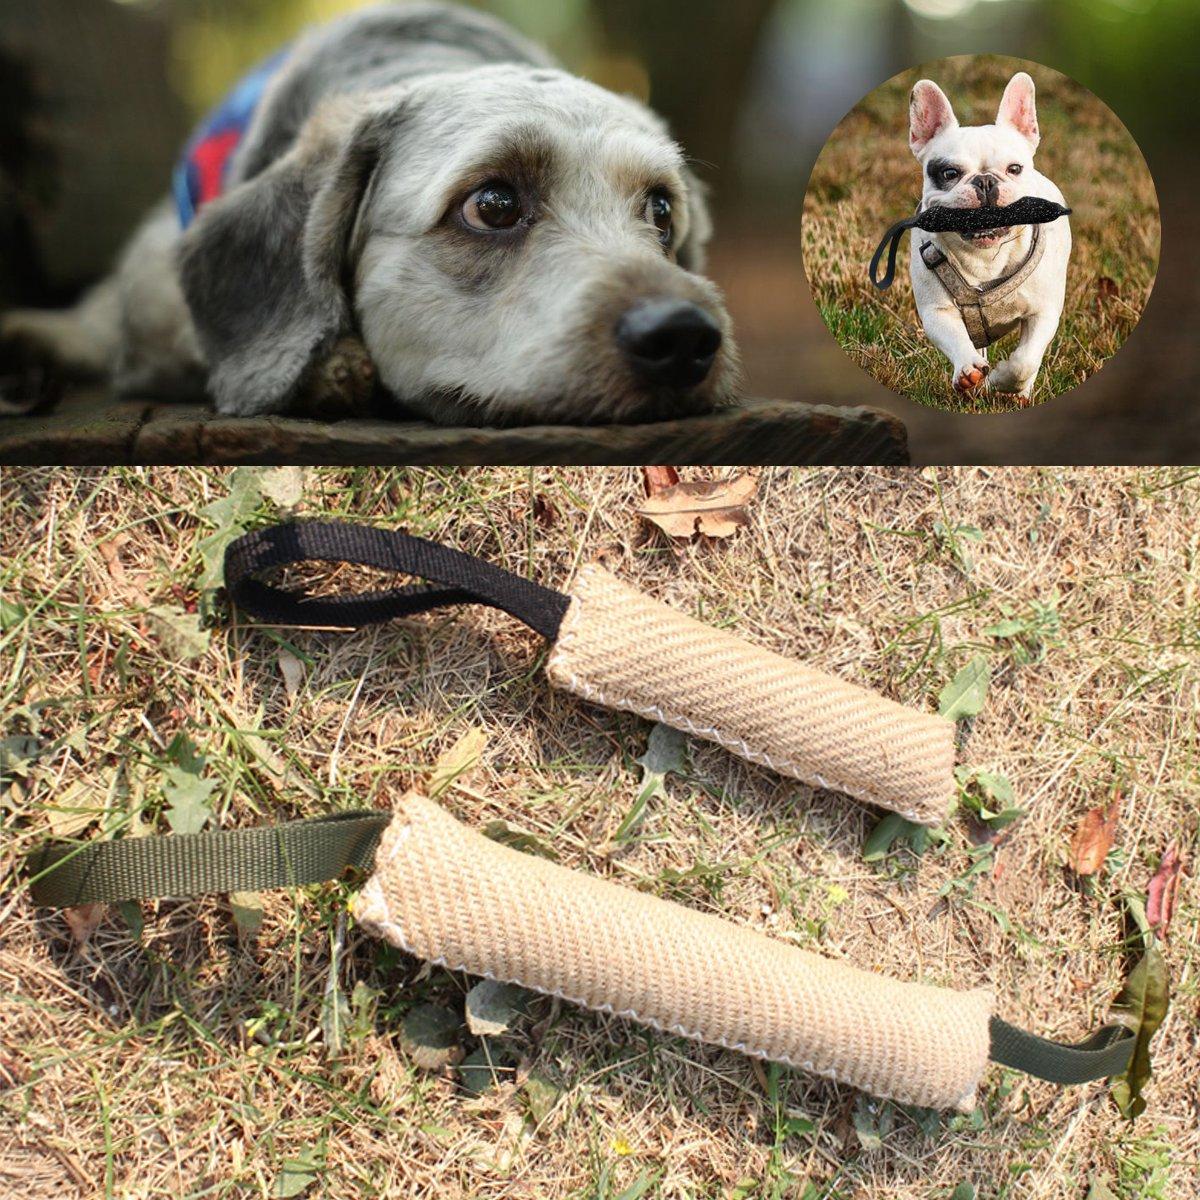 Dog Bite Tug Training Toy Durable Jute Stick Puppy Pet ...